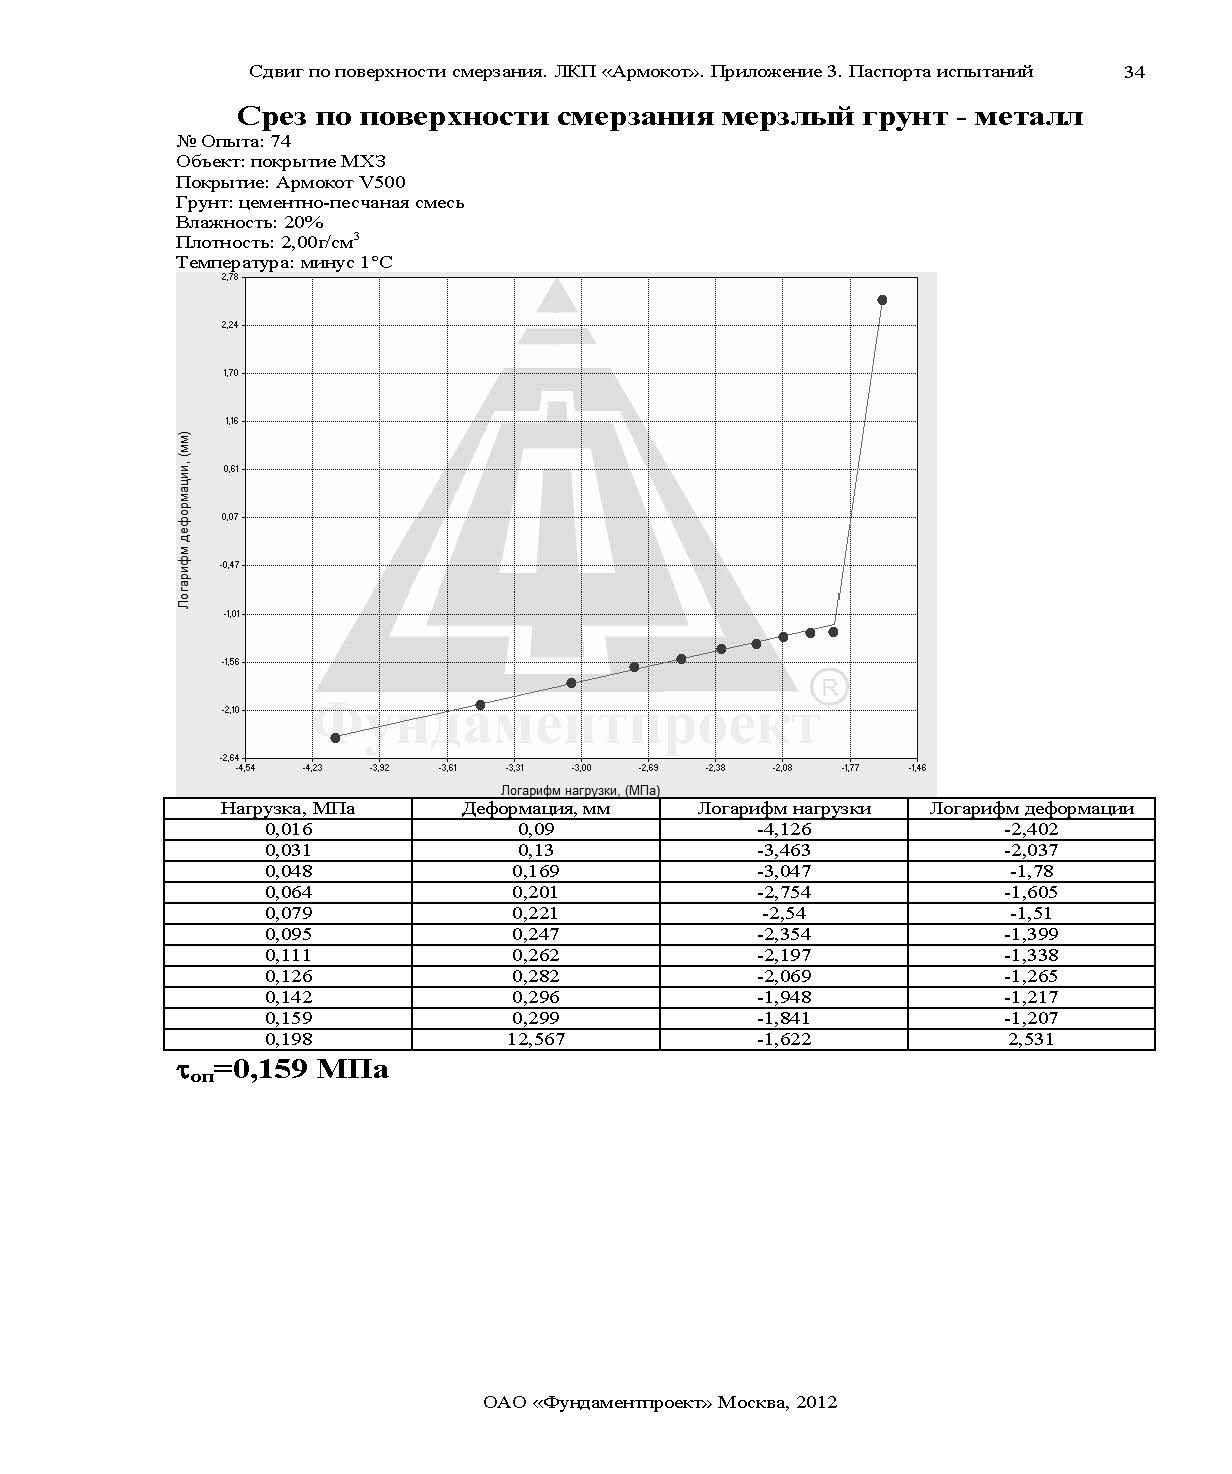 Отчет по сваям Армокот V500 Фундаментпроект_Страница_59